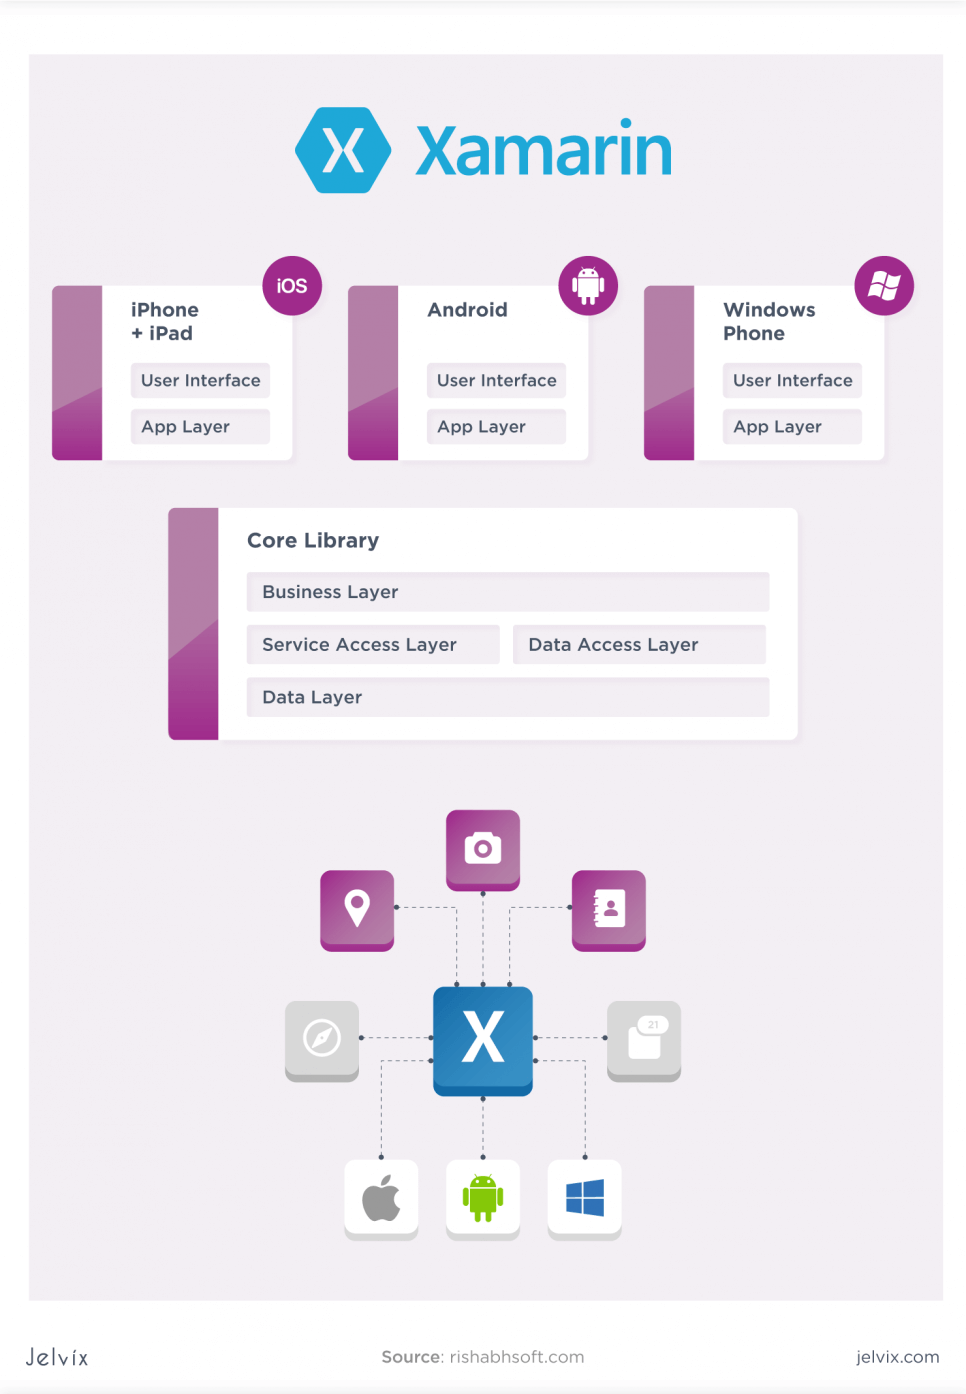 Xamarin and C# tech stacks